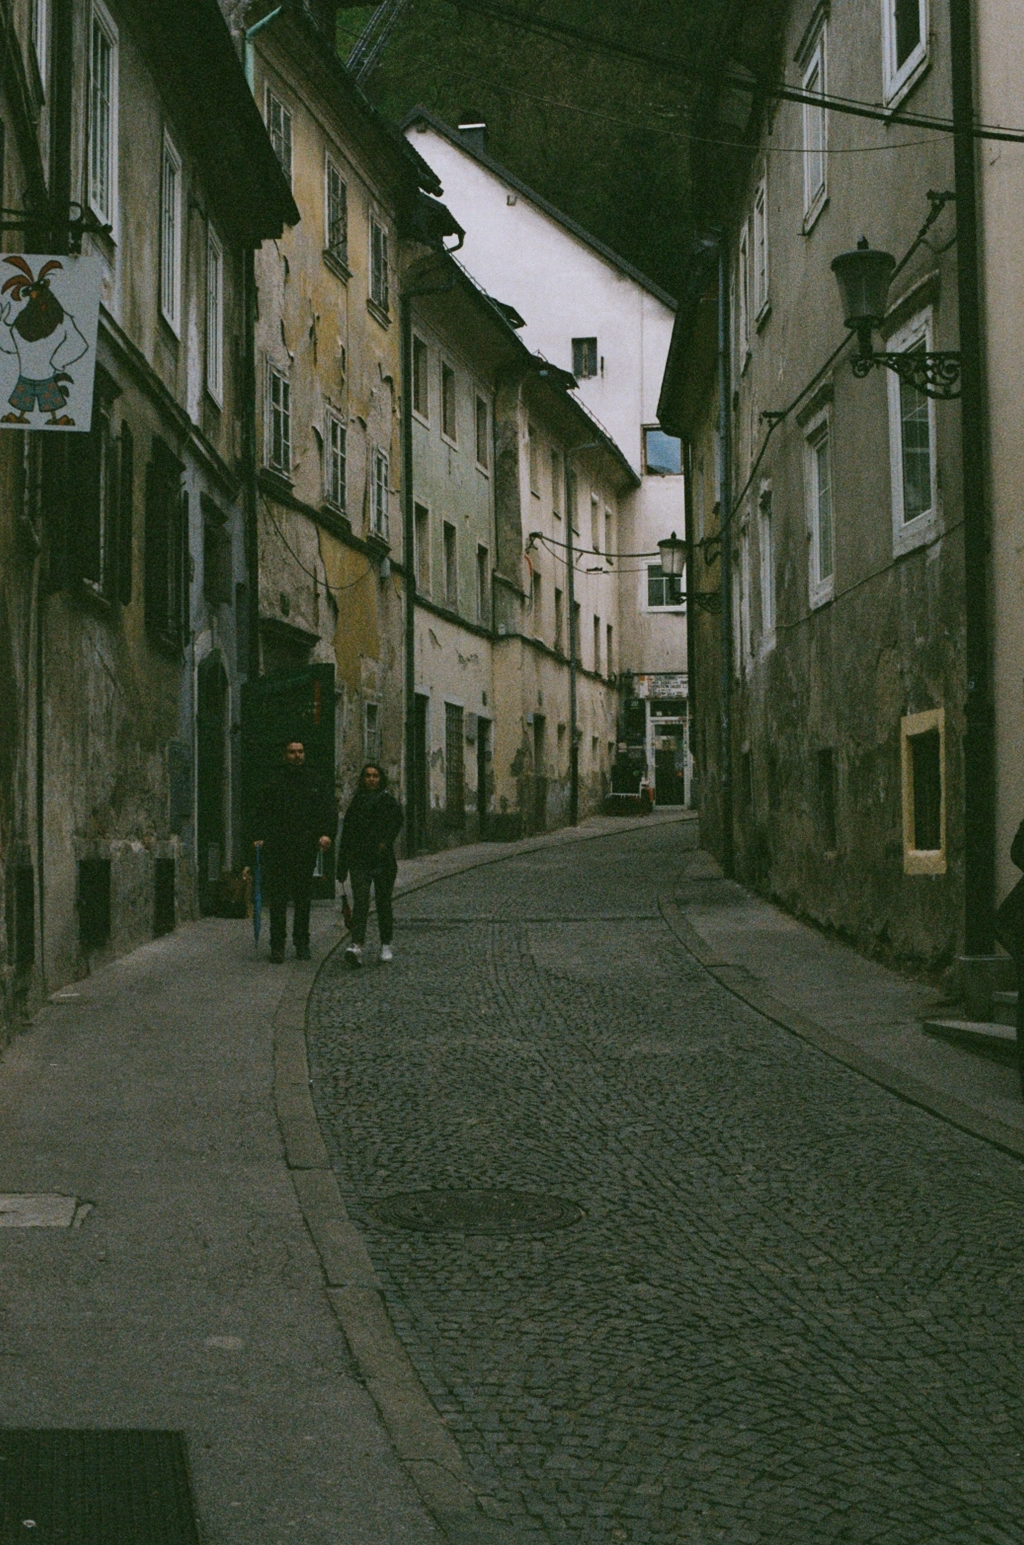 Llubljana, Slovenia